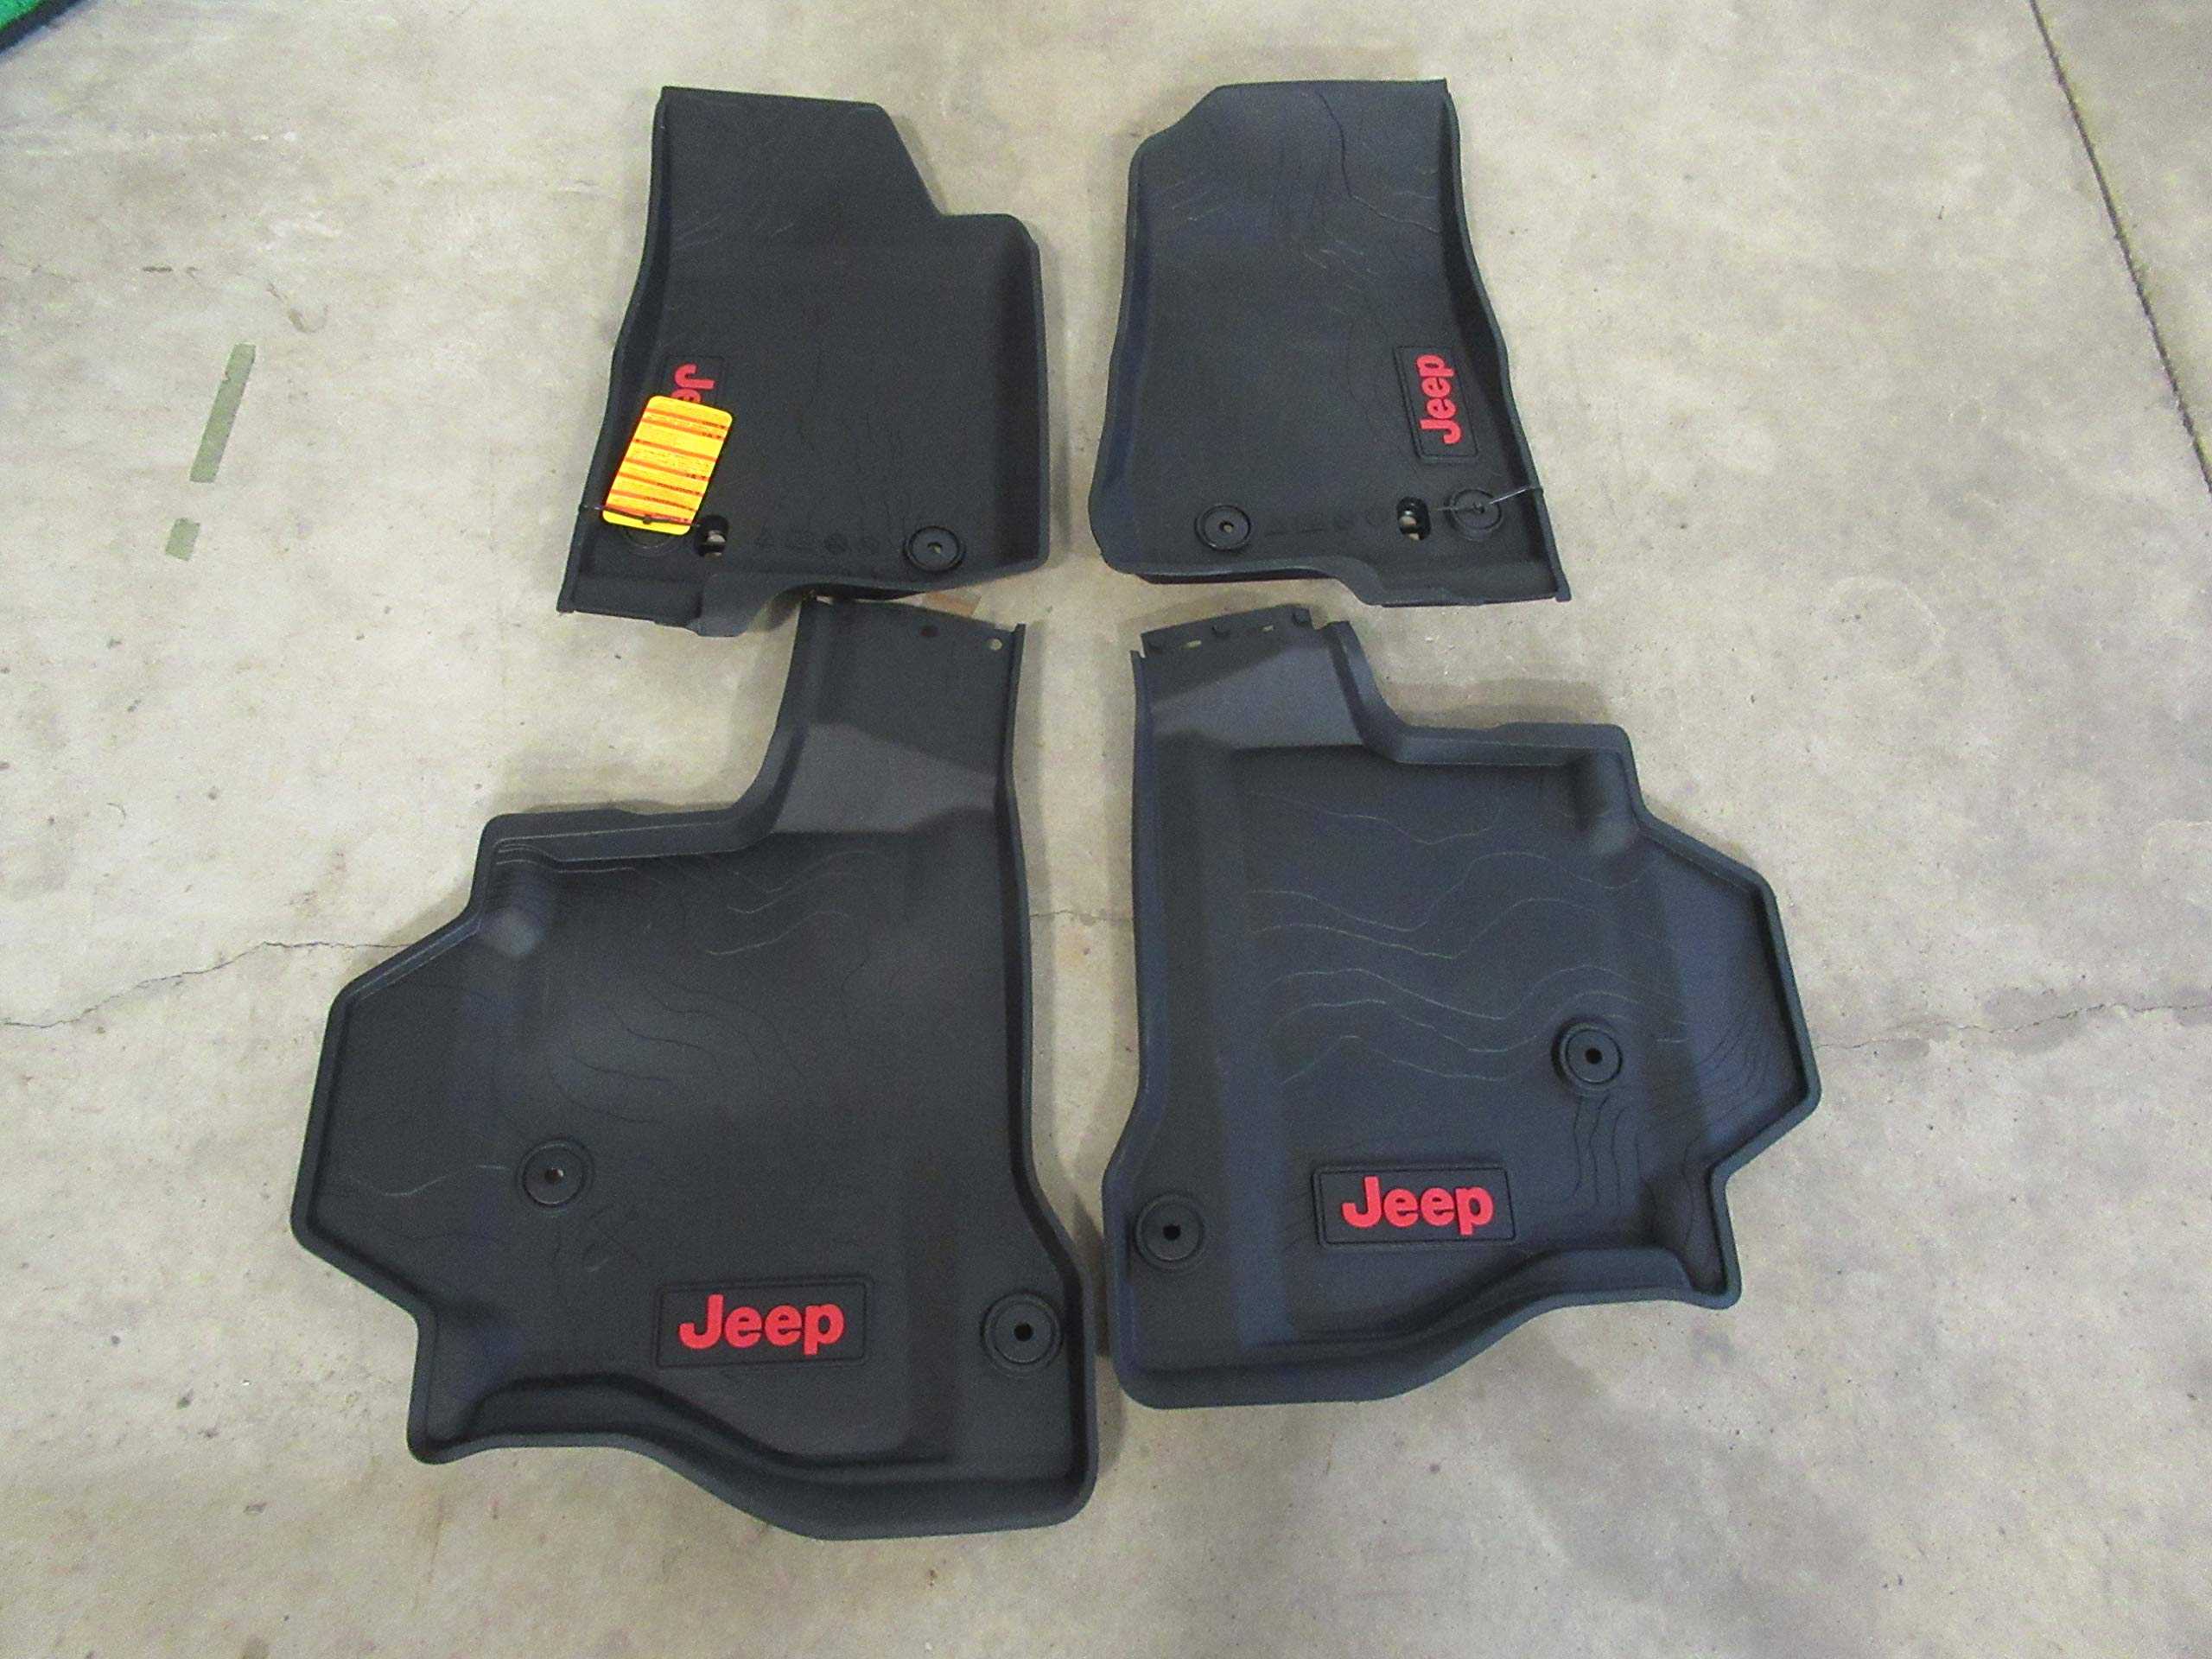 Mopar Jeep Gladiator Front & Rear Complete Set of 4 Rubber Floor Mats OEM by Mopar